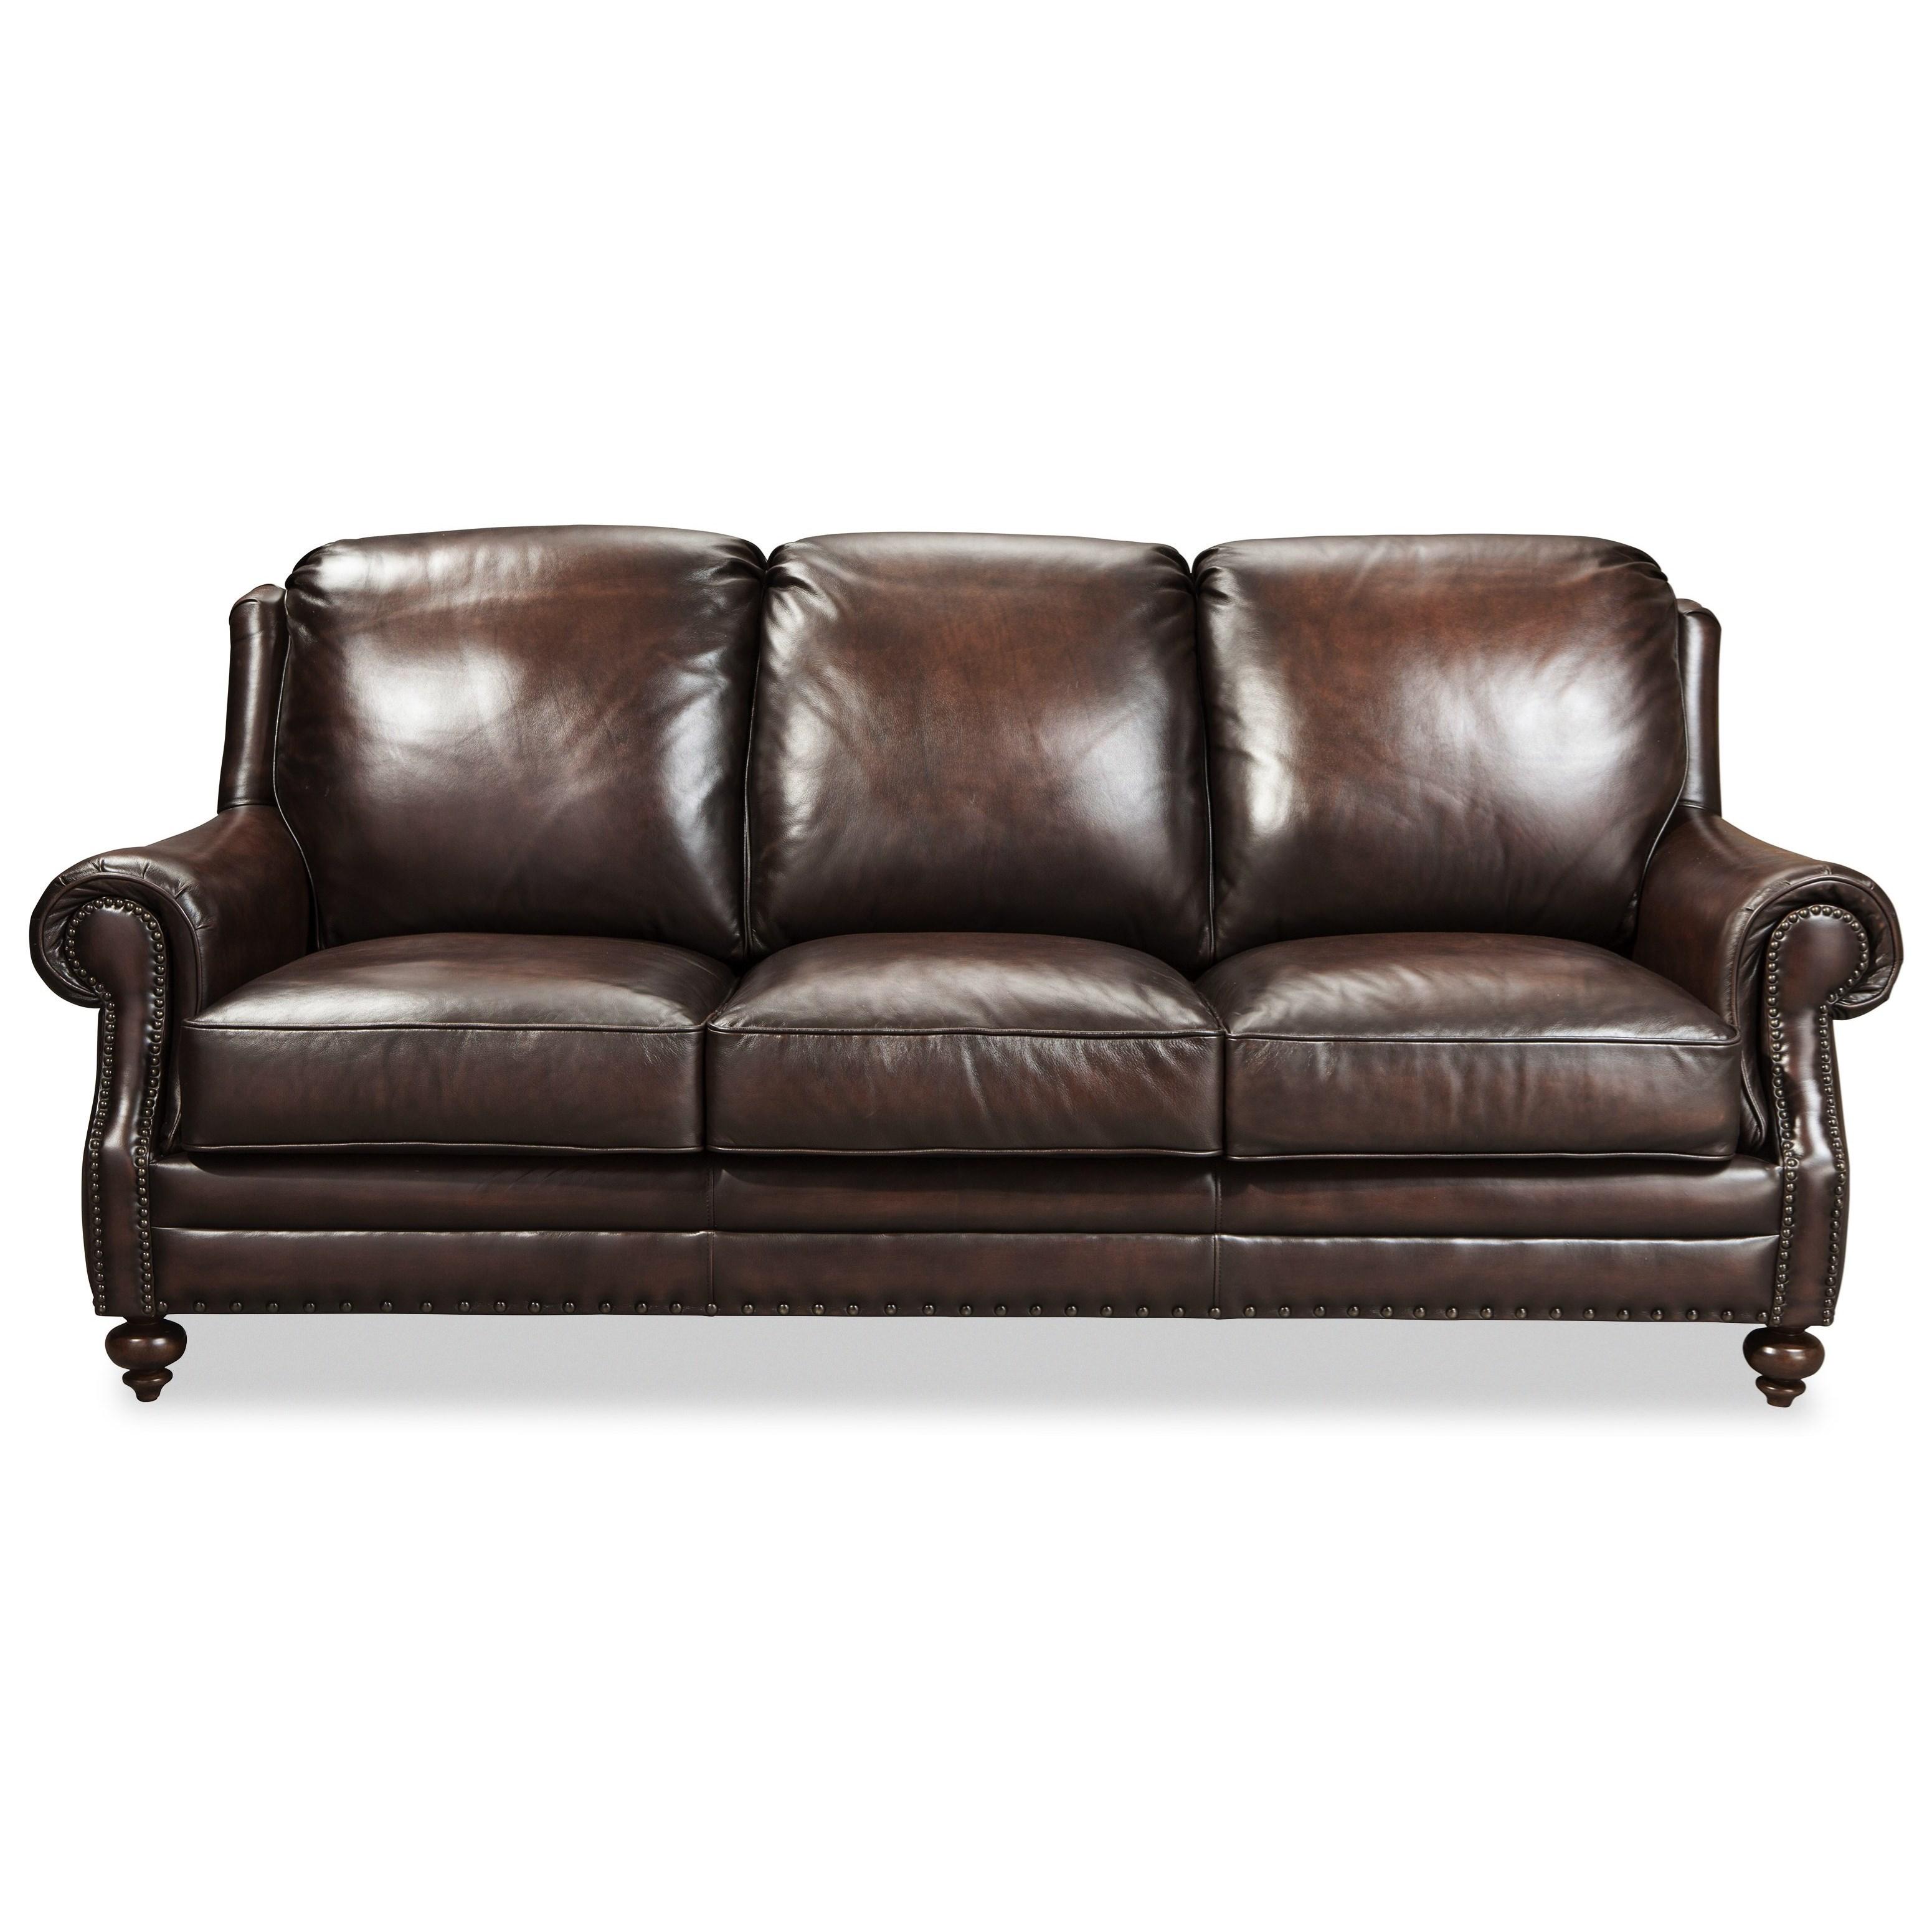 Craftmaster L171250 Craftmaster Traditonal Leather Sofa